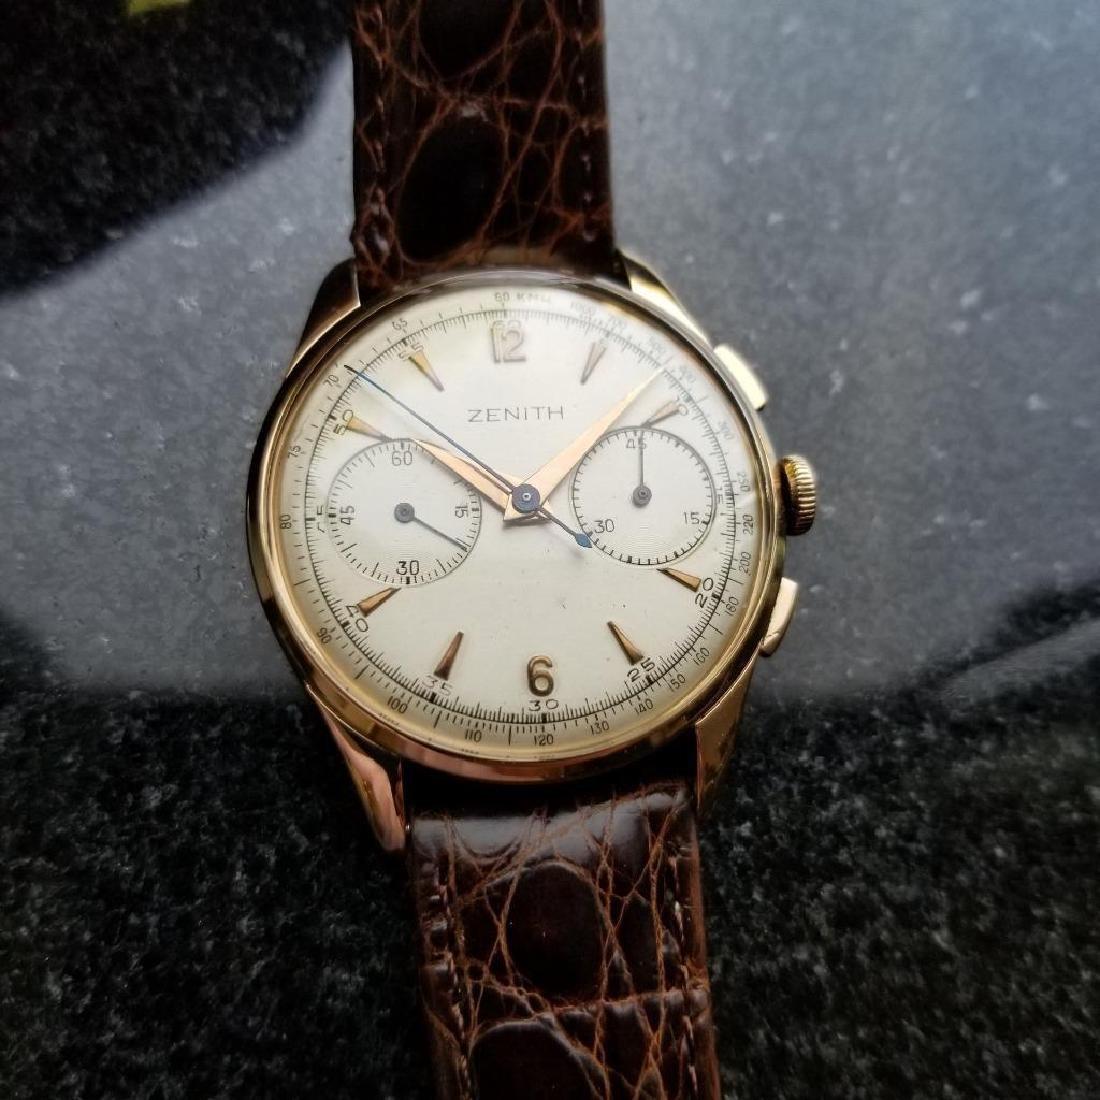 Zenith Vintage 18K Solid Rose Gold 1960s Swiss Watch - 2